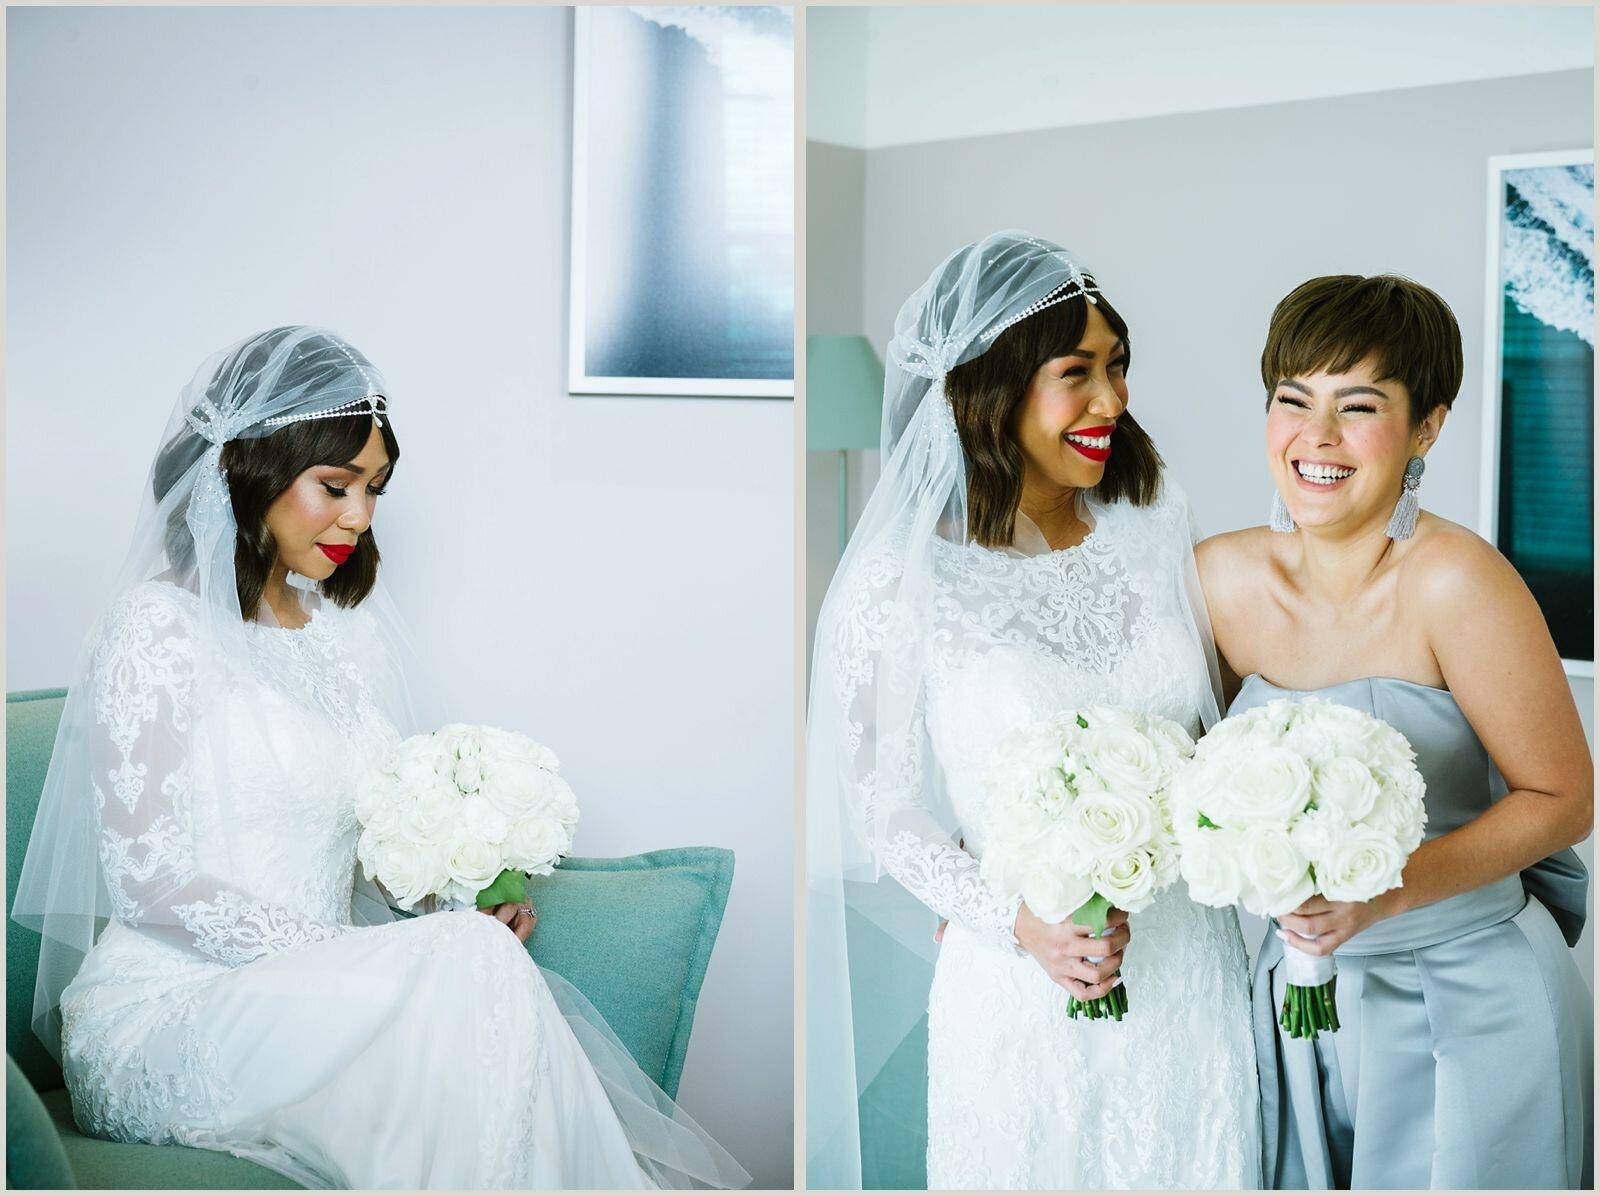 joseph_koprek_wedding_melbourne_the_prince_deck_0012.jpg